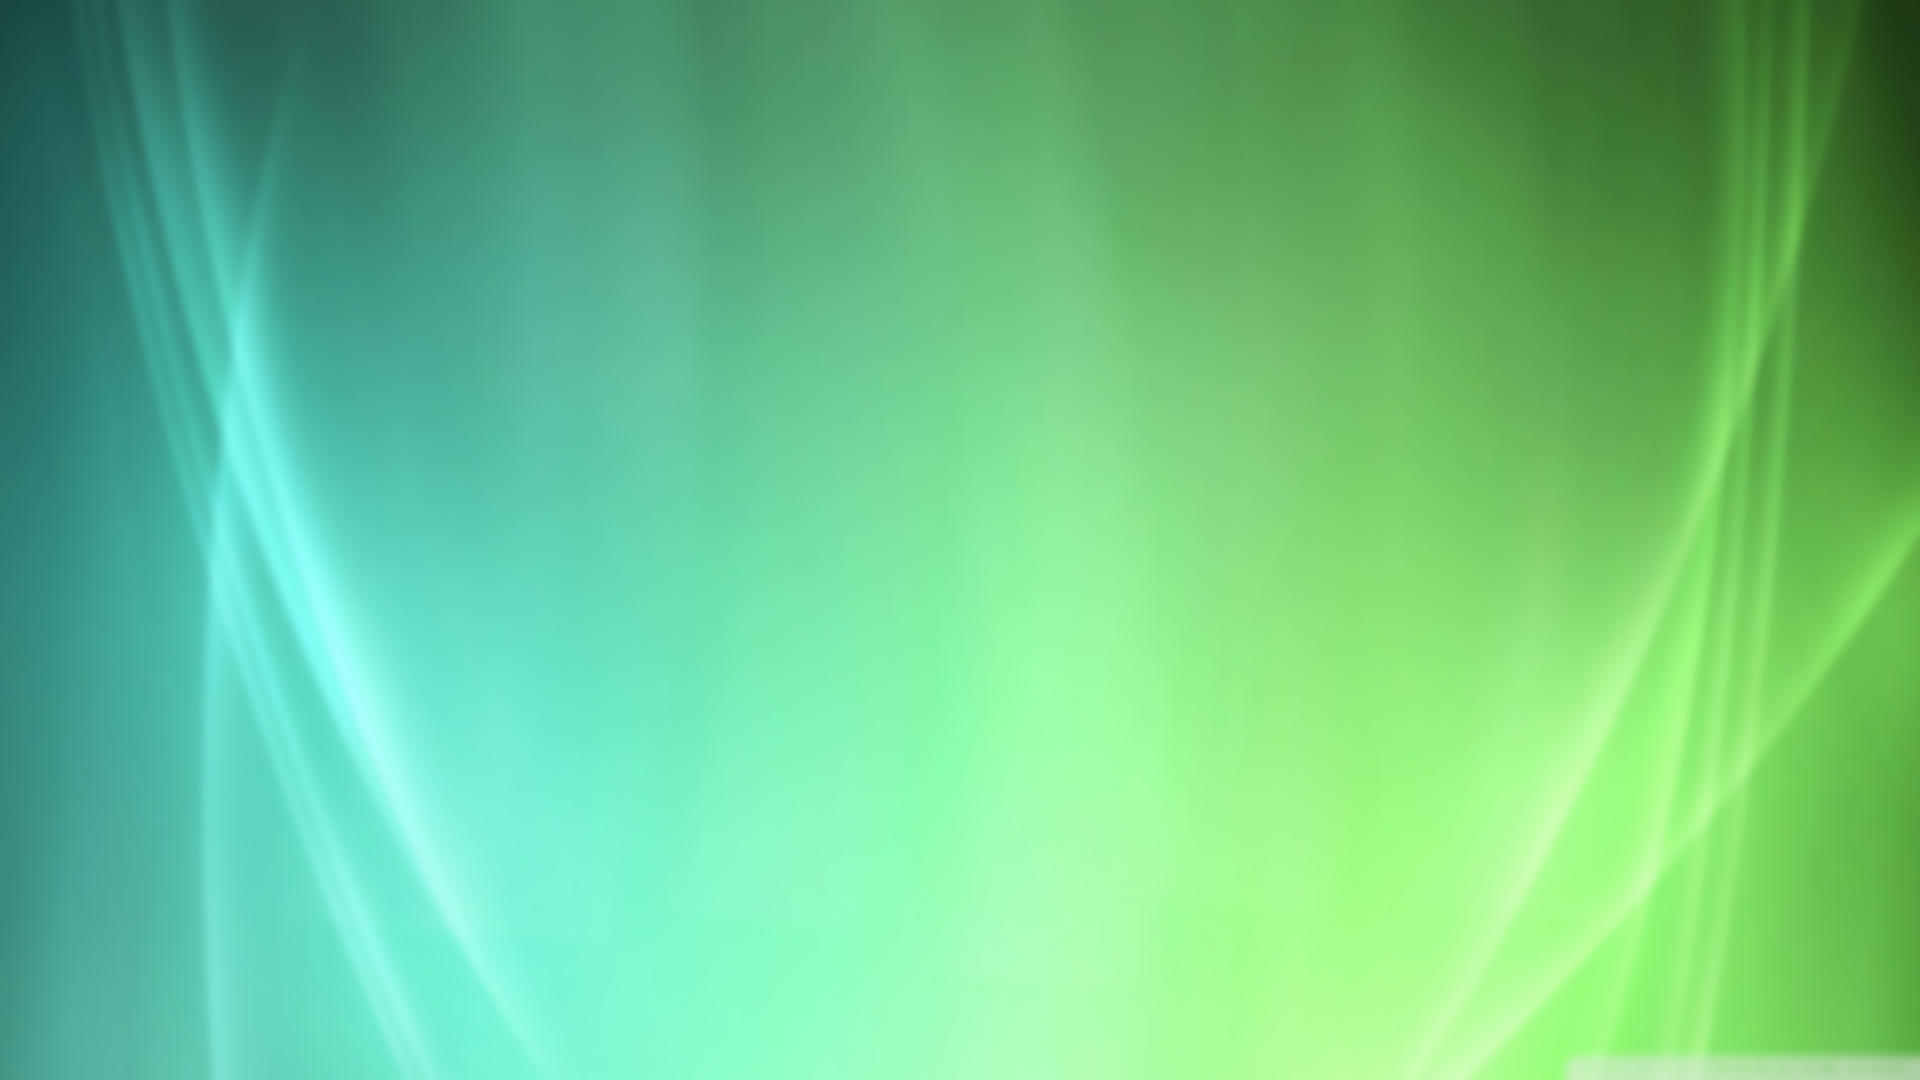 aero_green_and_light_blue-wallpaper-1920x10801